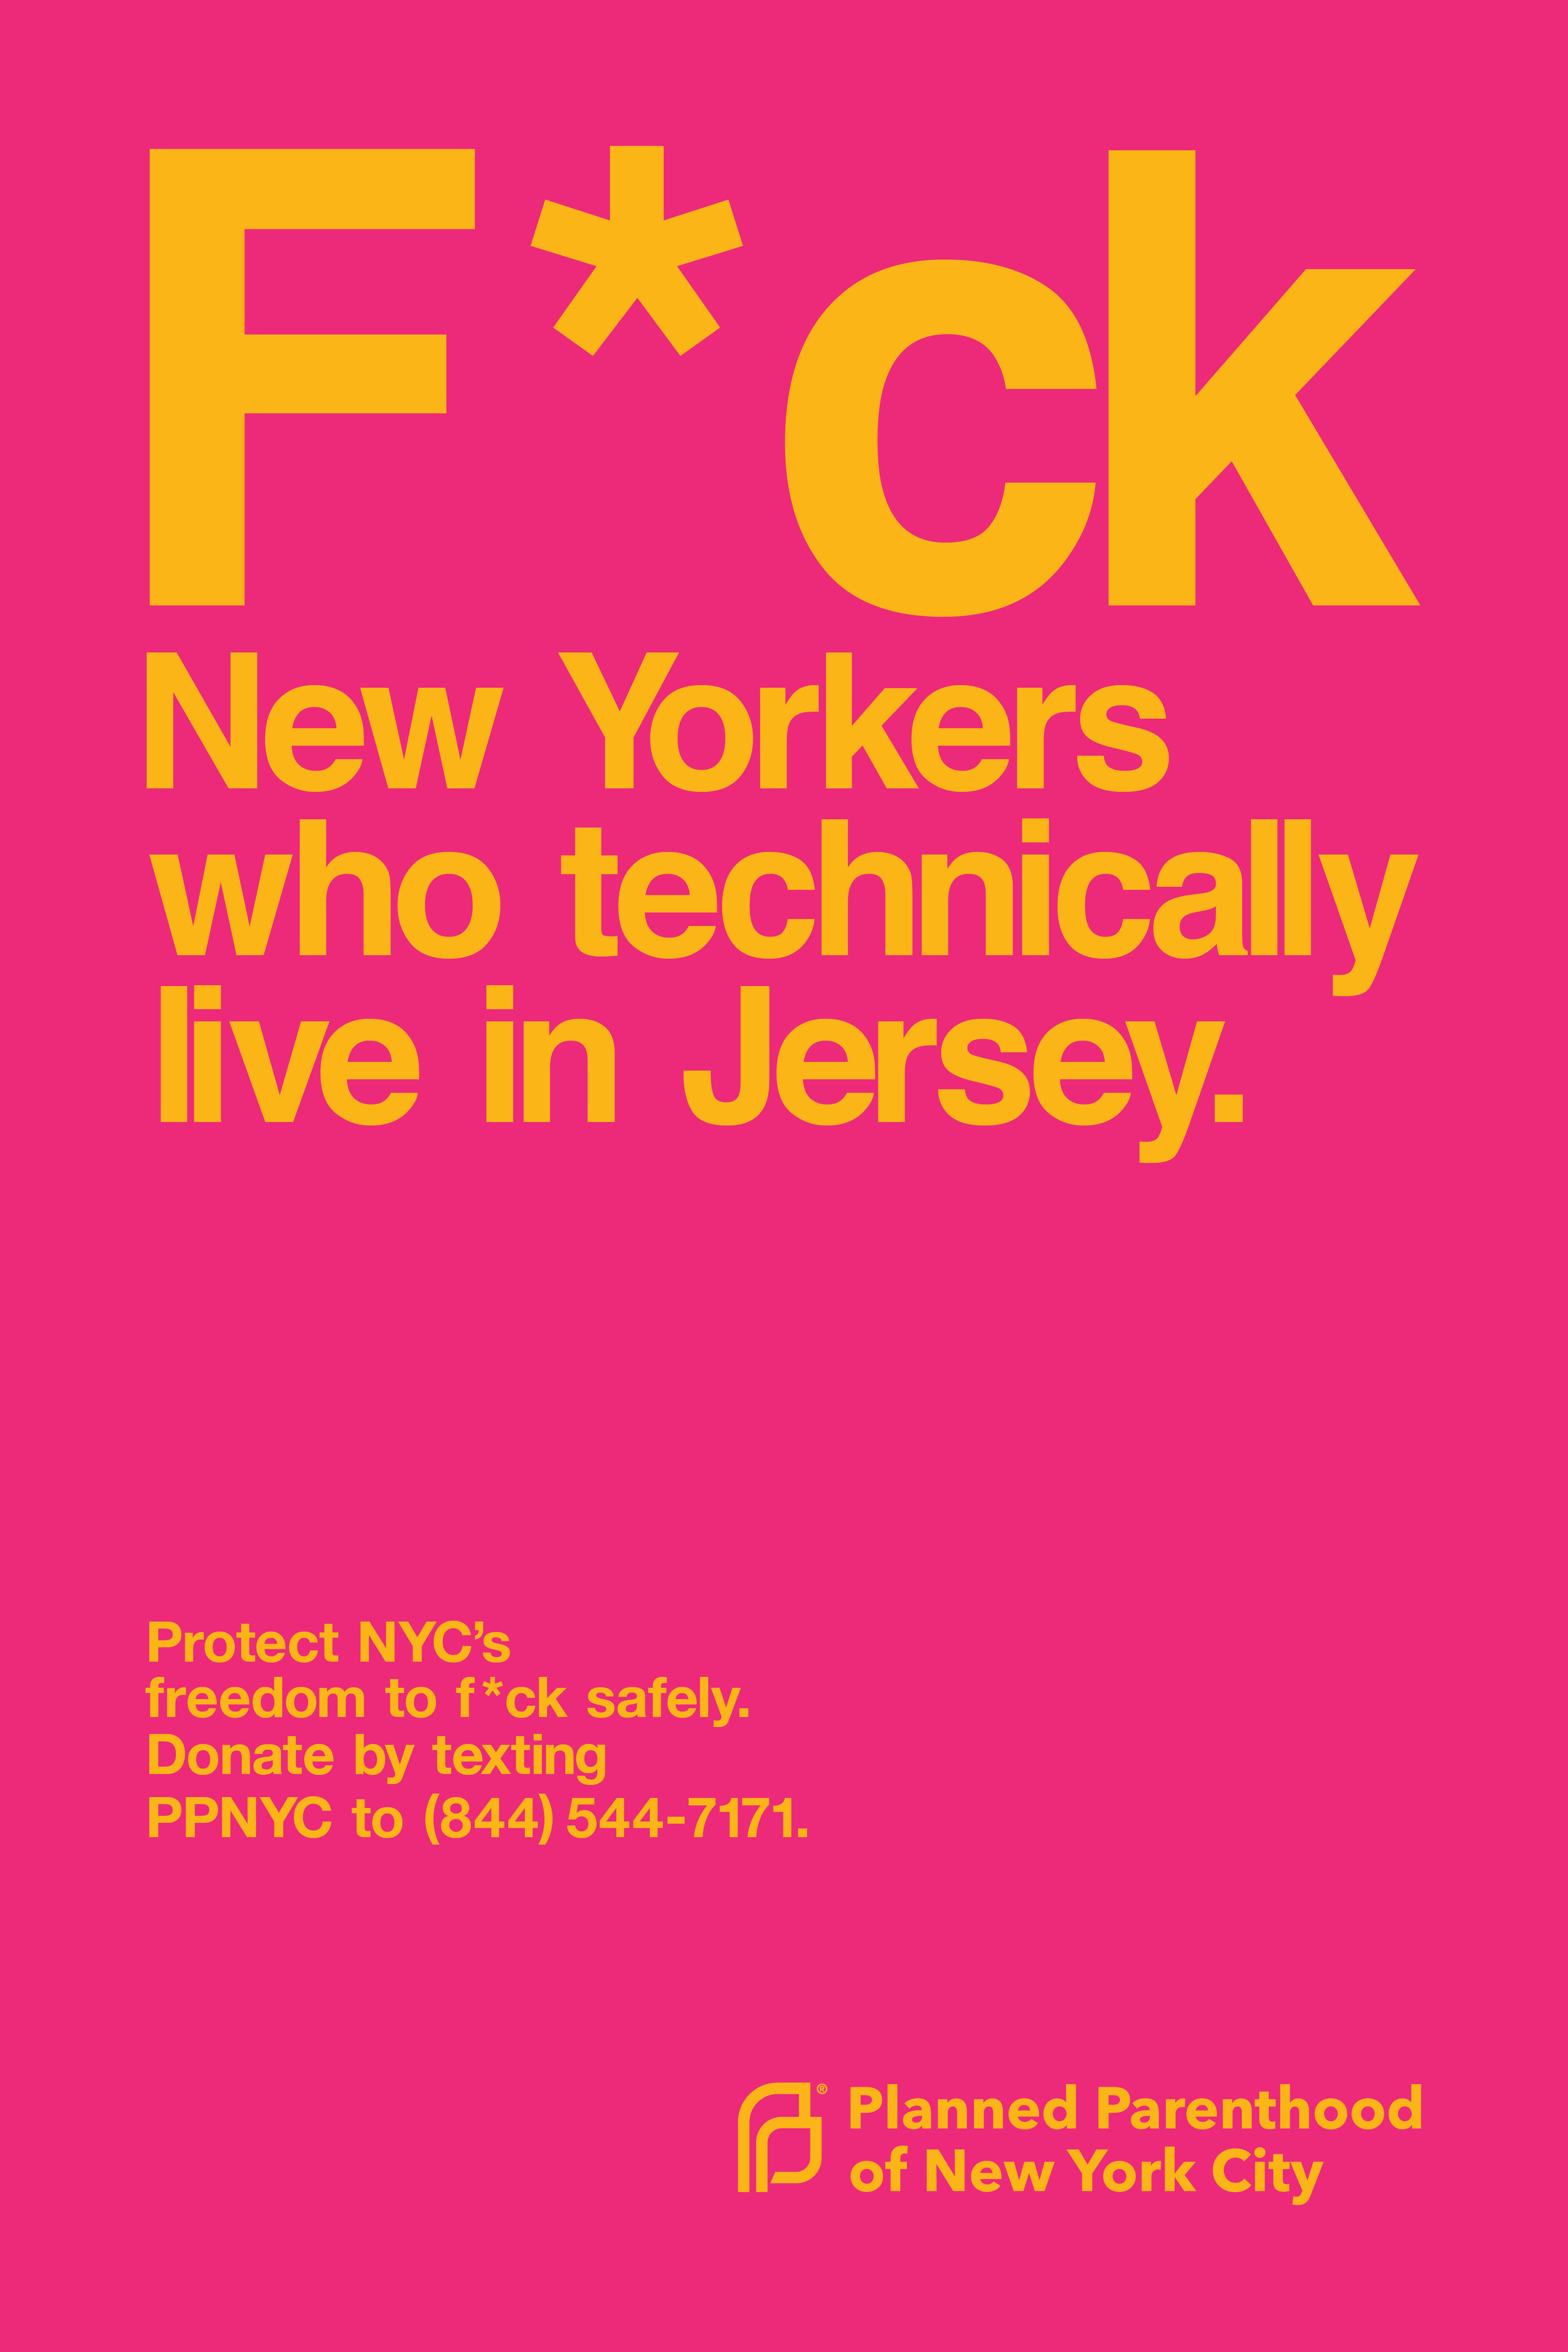 PPNYC_PRINT10.jpg